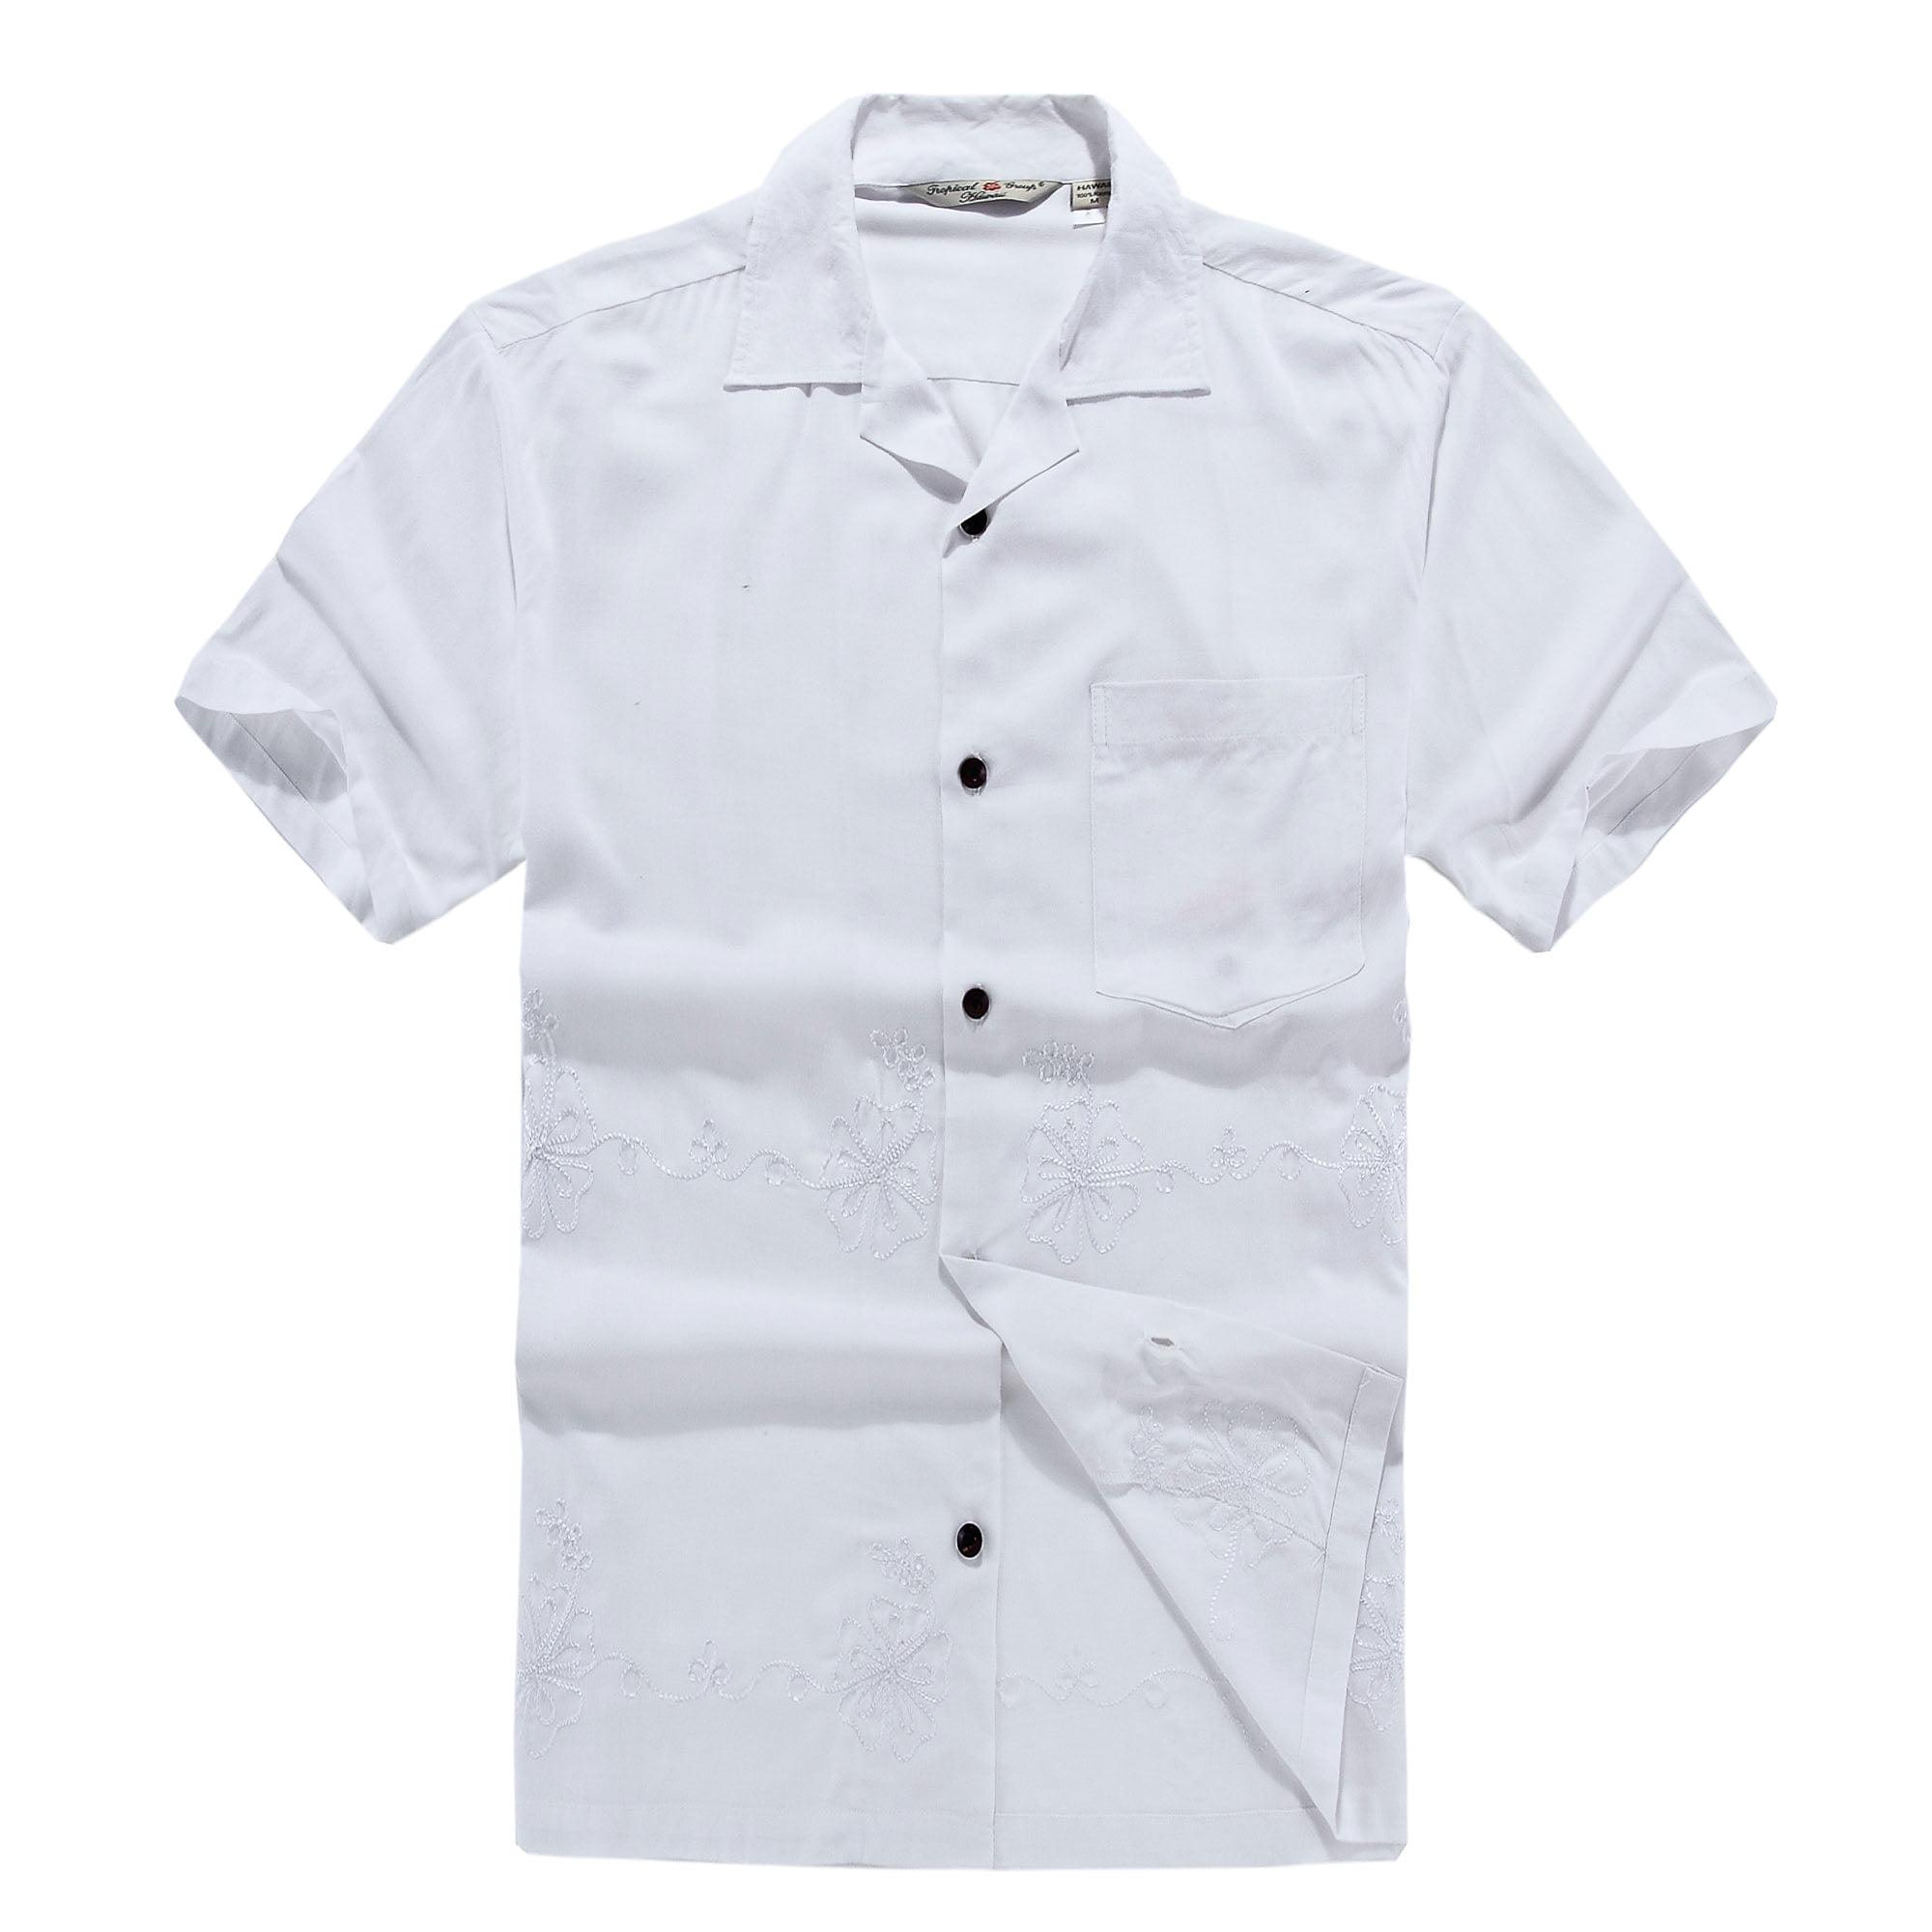 Hawaii Hangover Mens Hawaiian Shirt Aloha Shirt Xl White